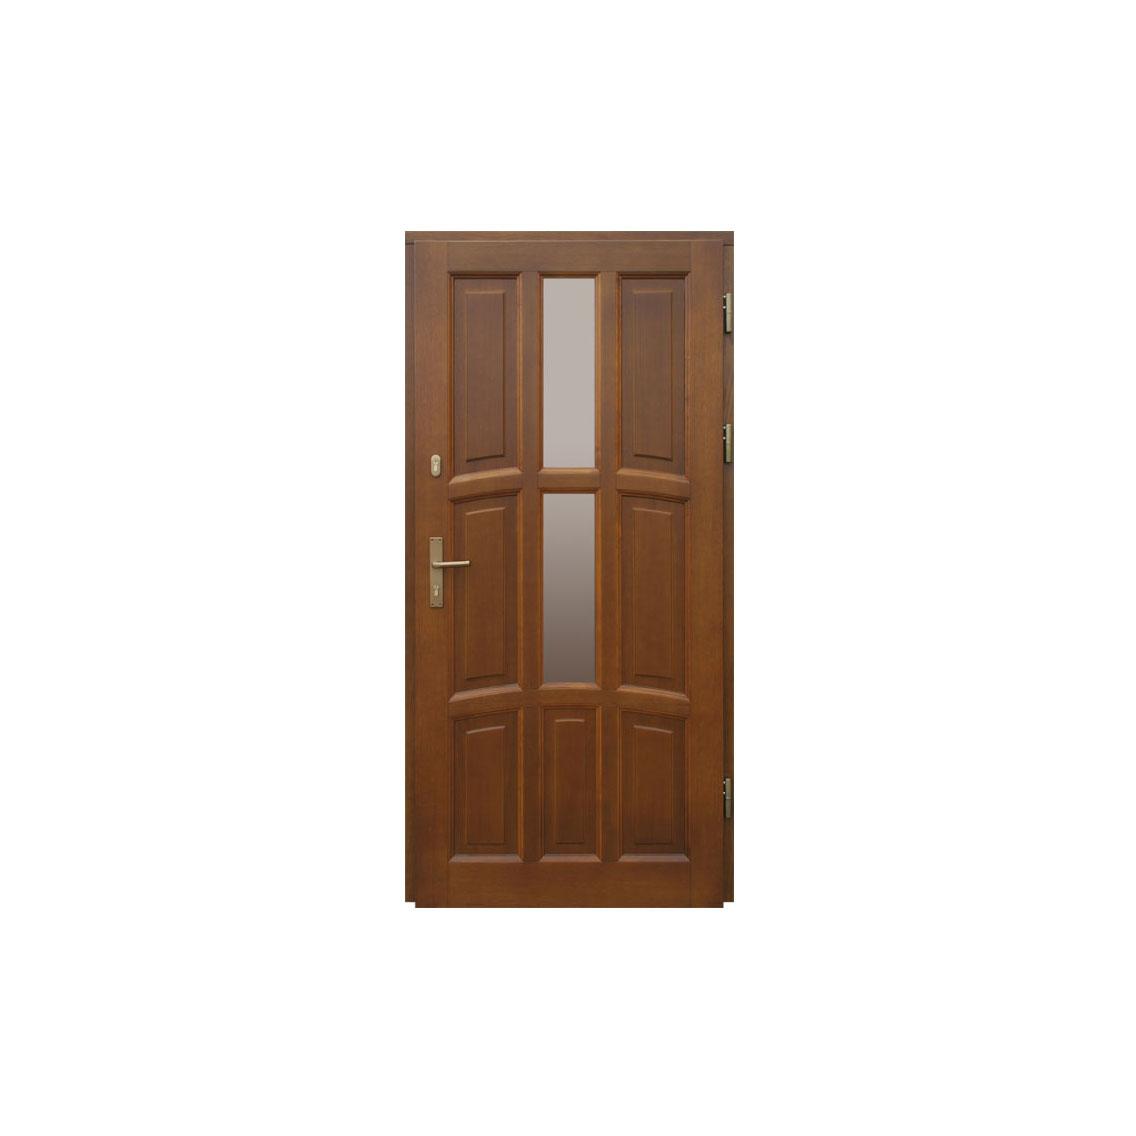 Koka durvis WD-13